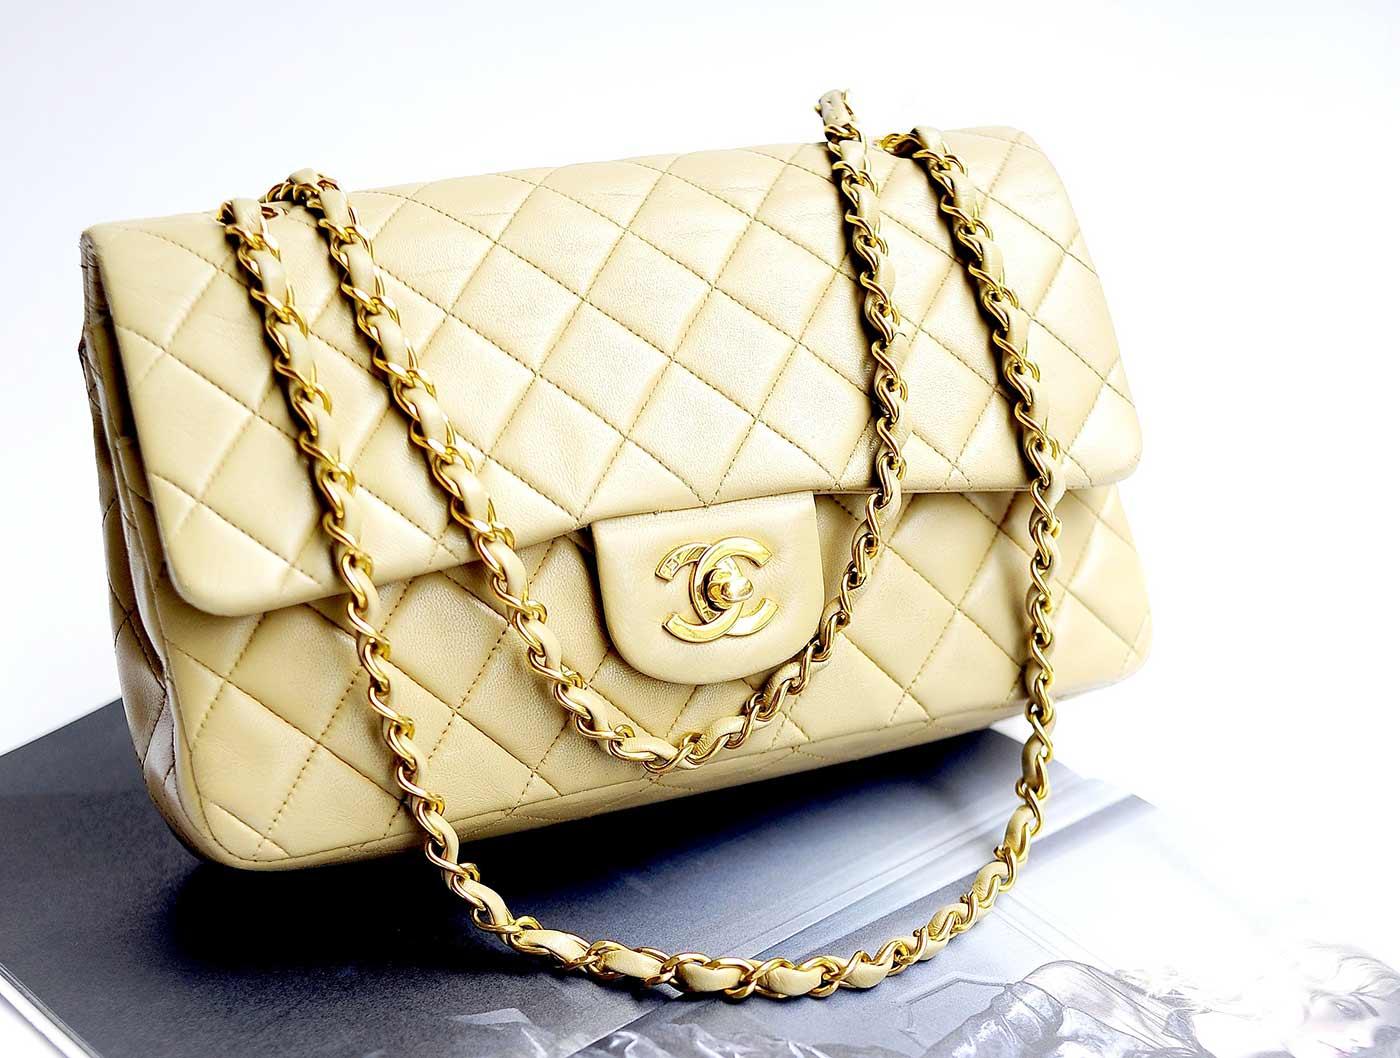 Chanel 2.55 purse